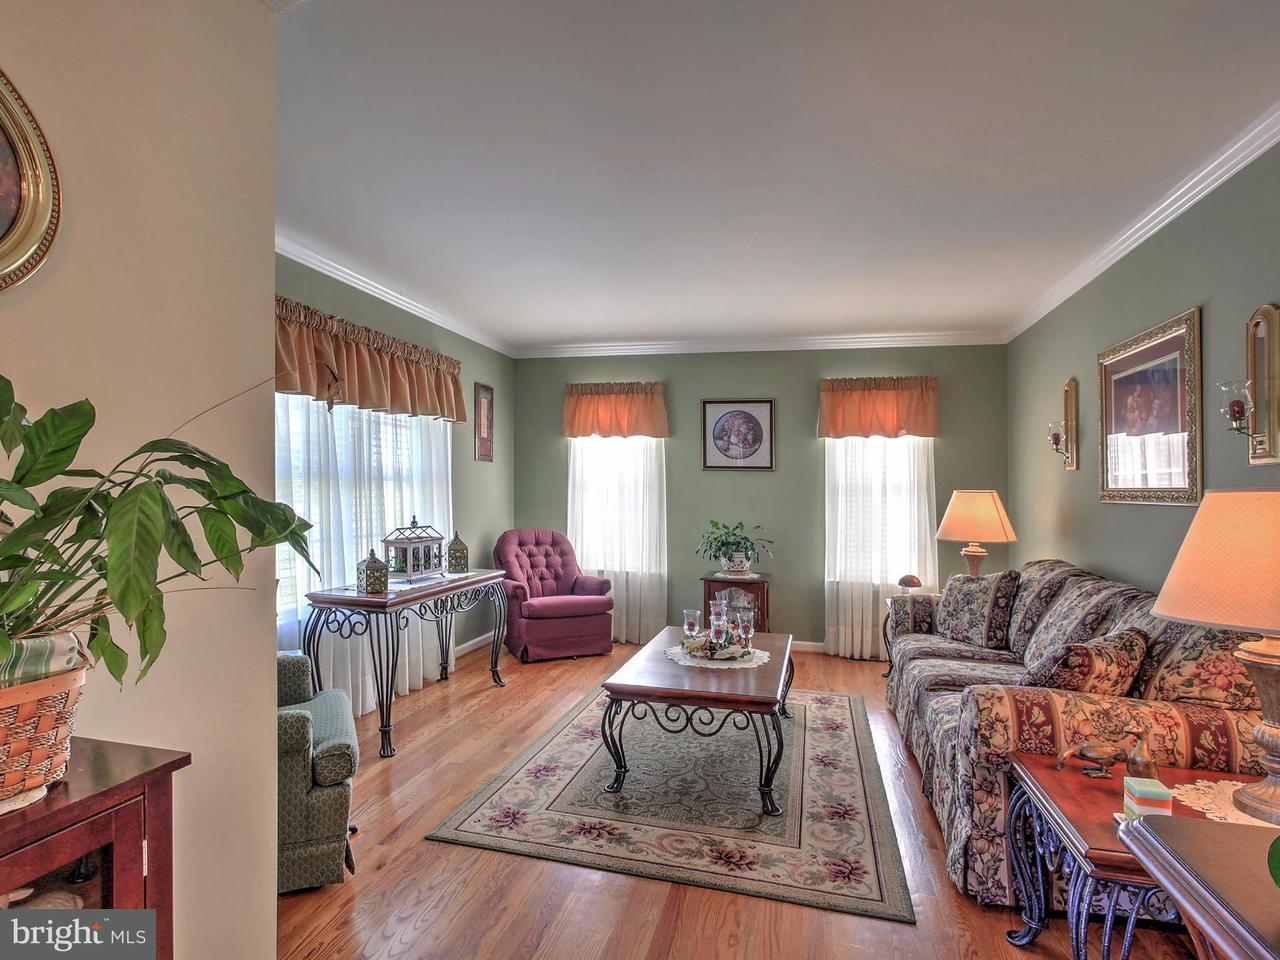 Additional photo for property listing at 110 Ordinary Way 110 Ordinary Way Louisa, 버지니아 23093 미국